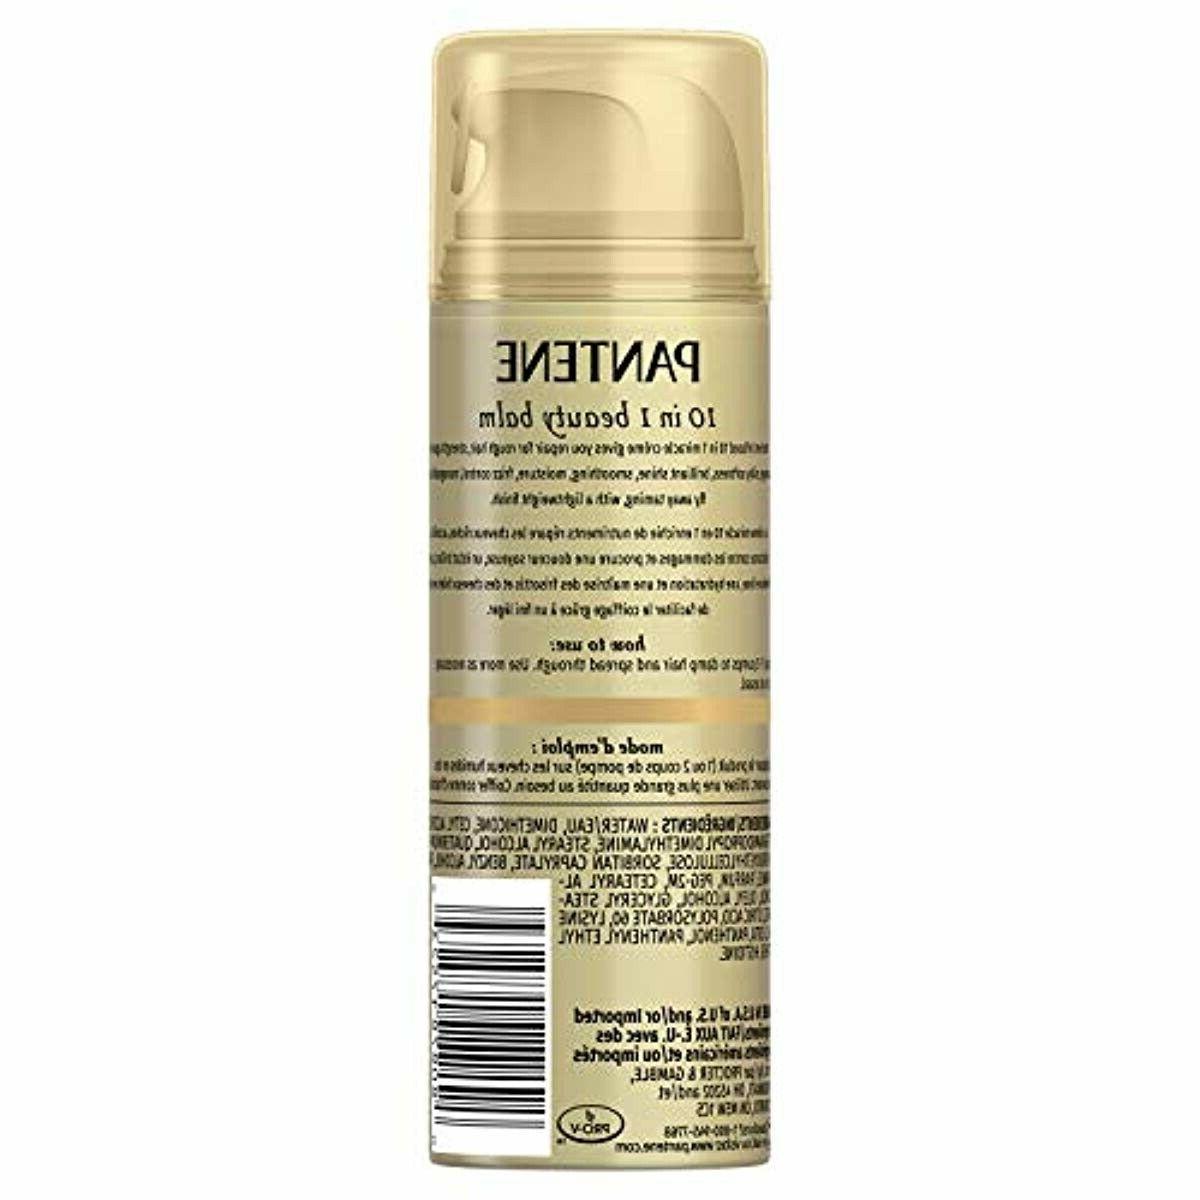 Pantene Pro-V Ultimate Beauty Crème Hair,